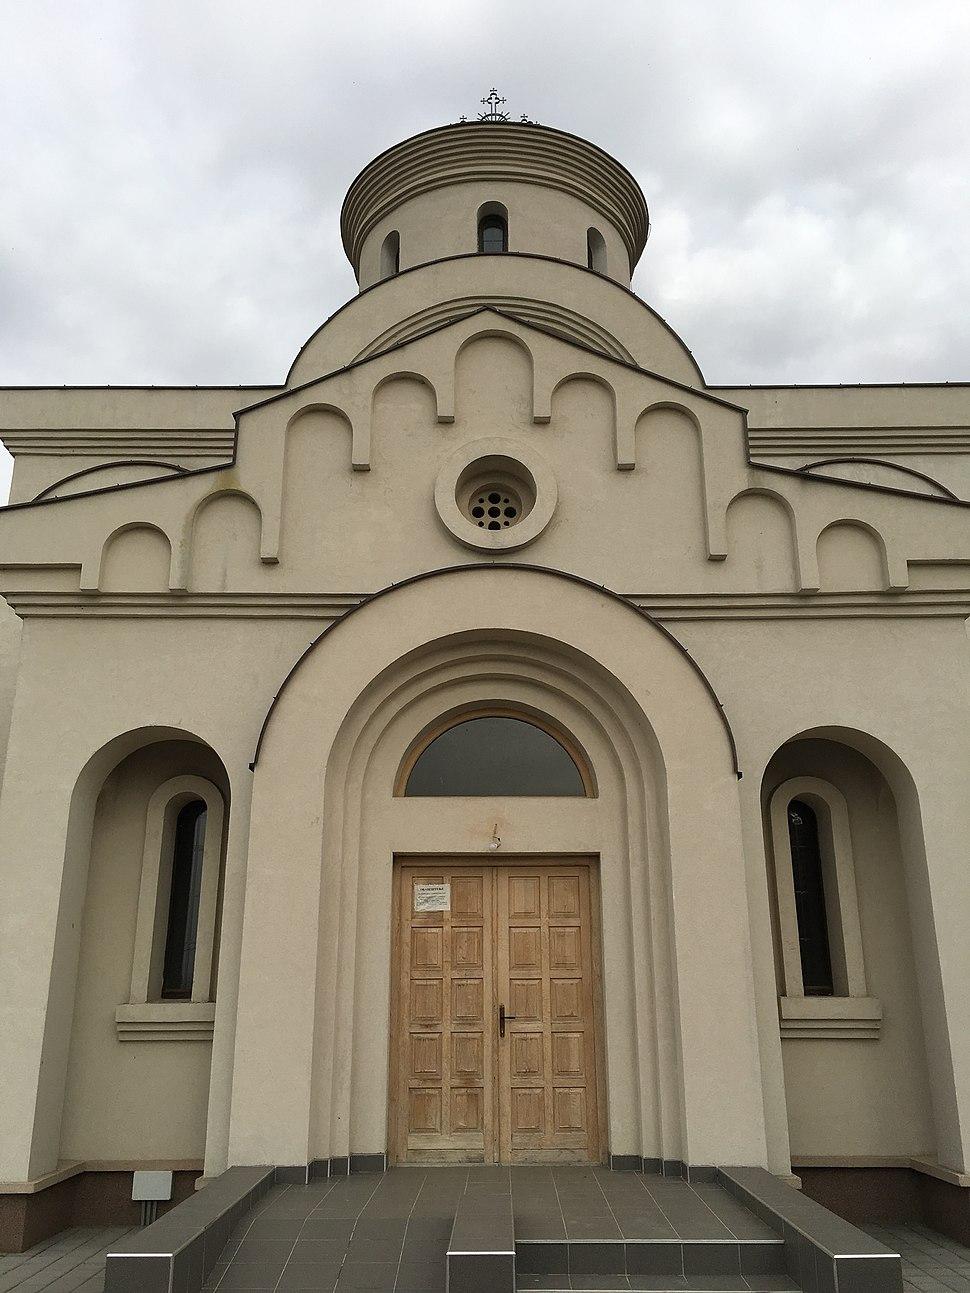 Crkva Svetog Nikole, Bojnik, Leskovac 25